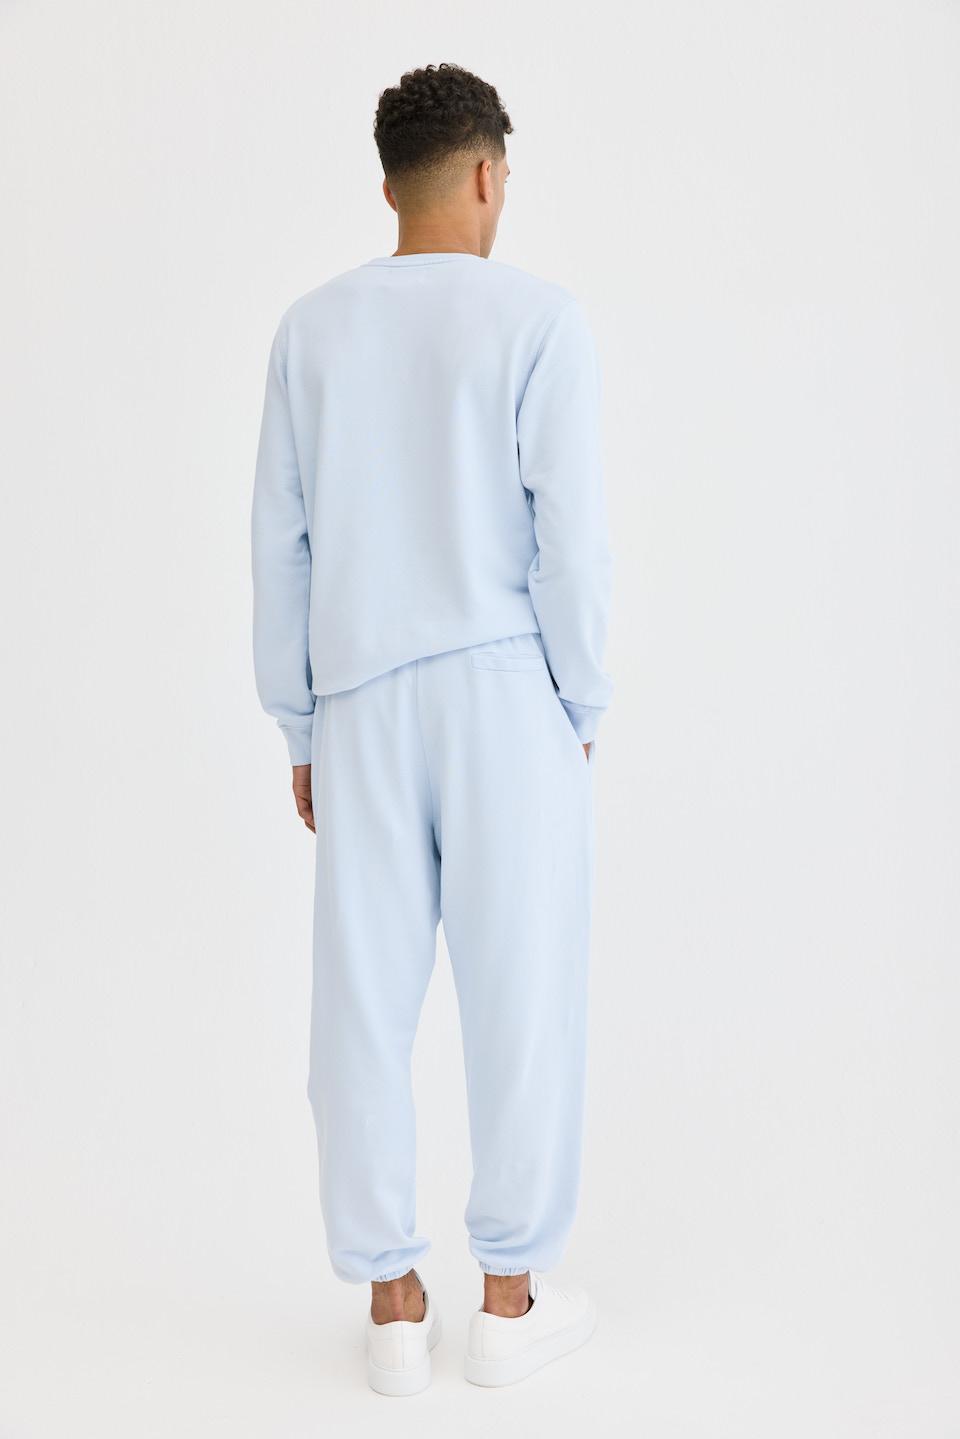 CPH Sweatpants 1M org. cotton light blue - alternative 1